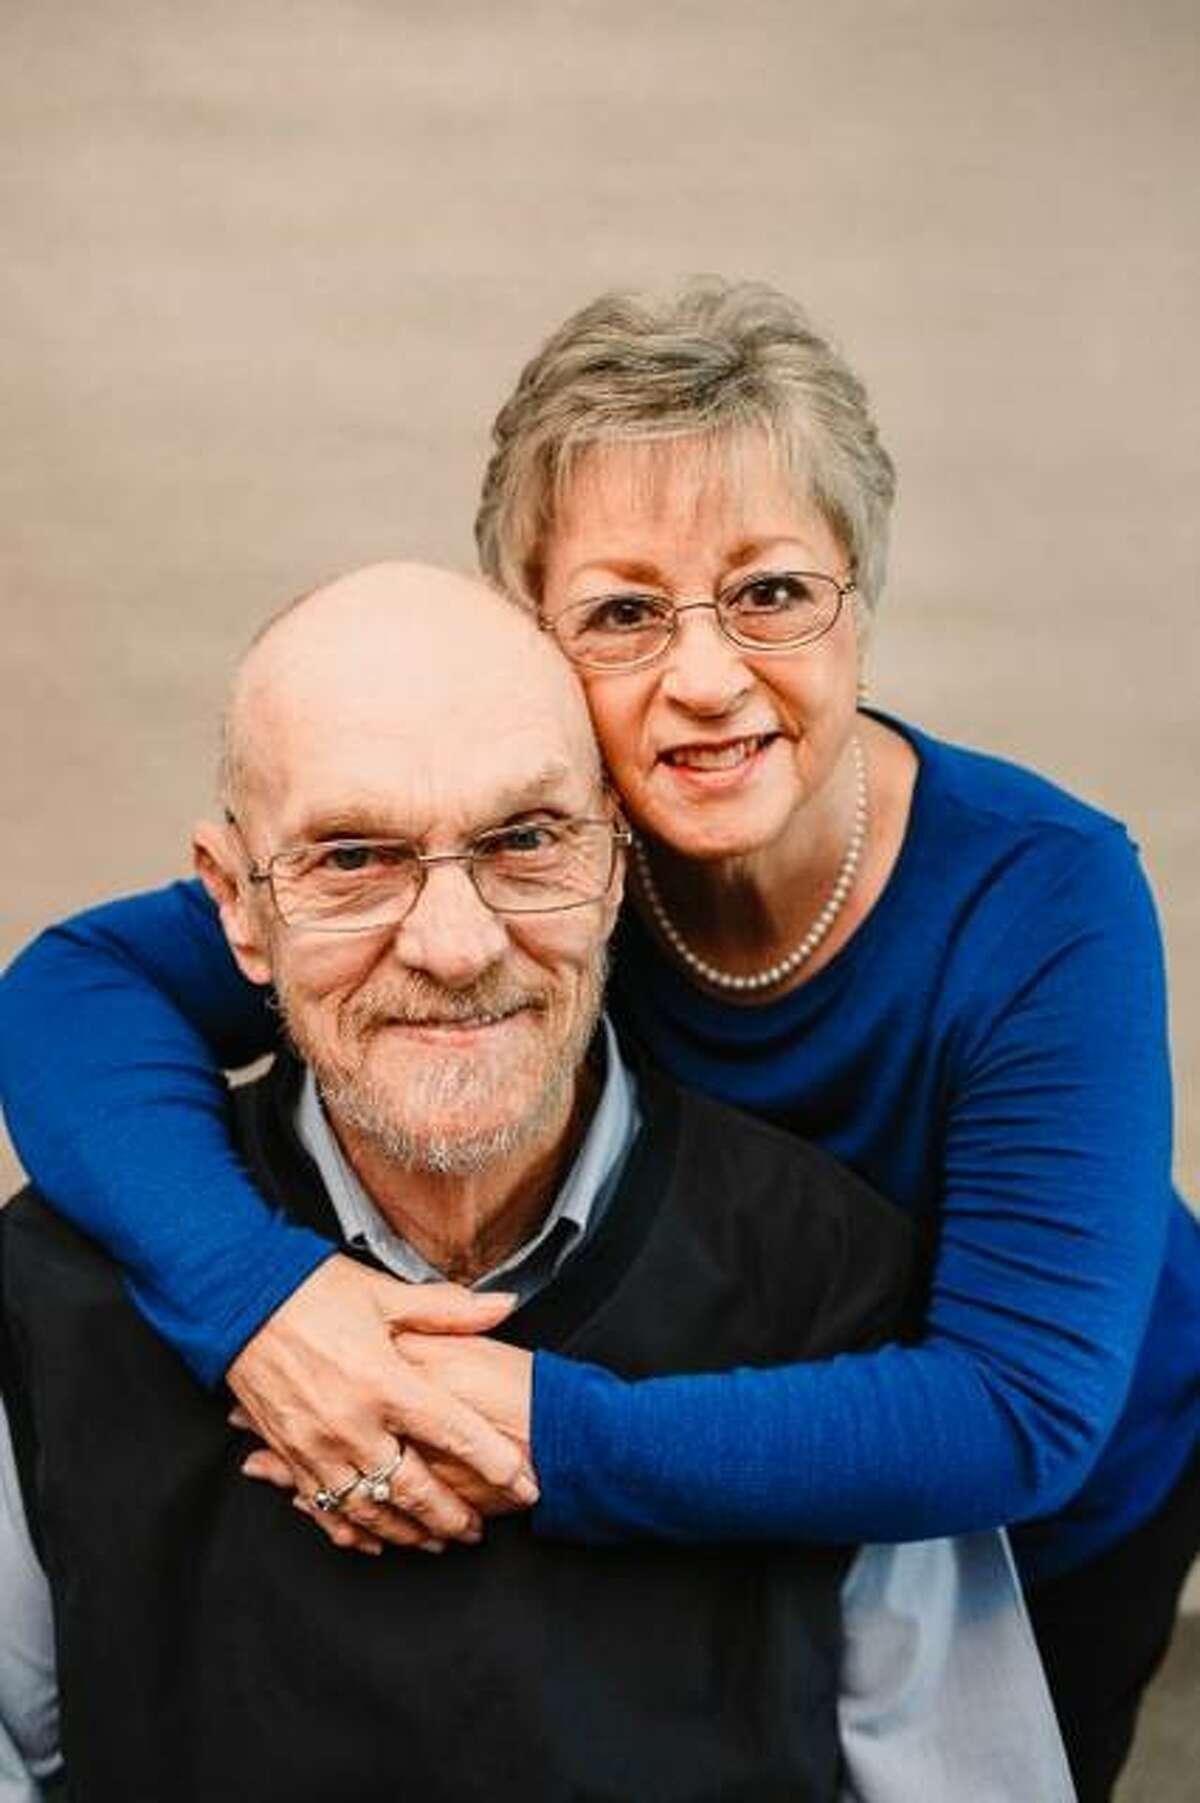 Earl and Linda Twente today